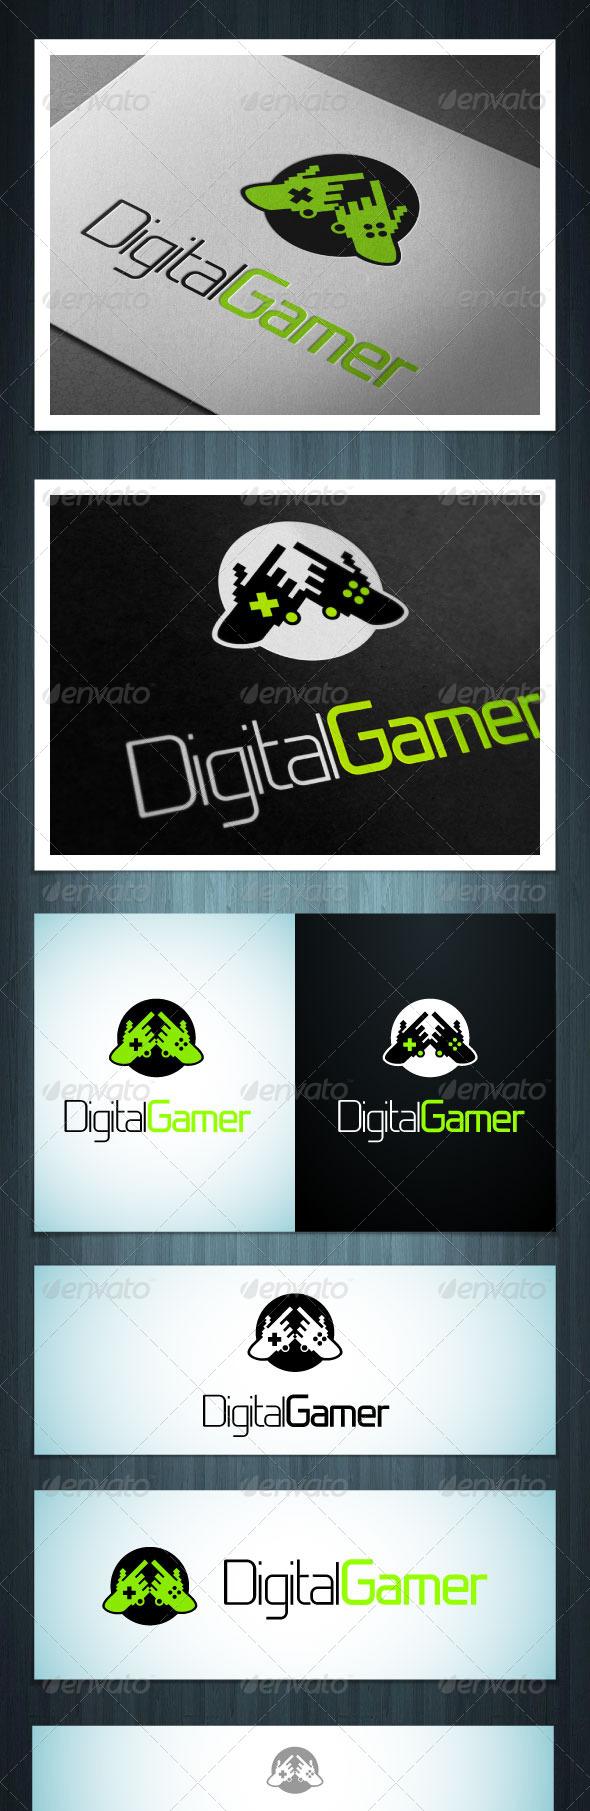 GraphicRiver DigitalGamer 5450467